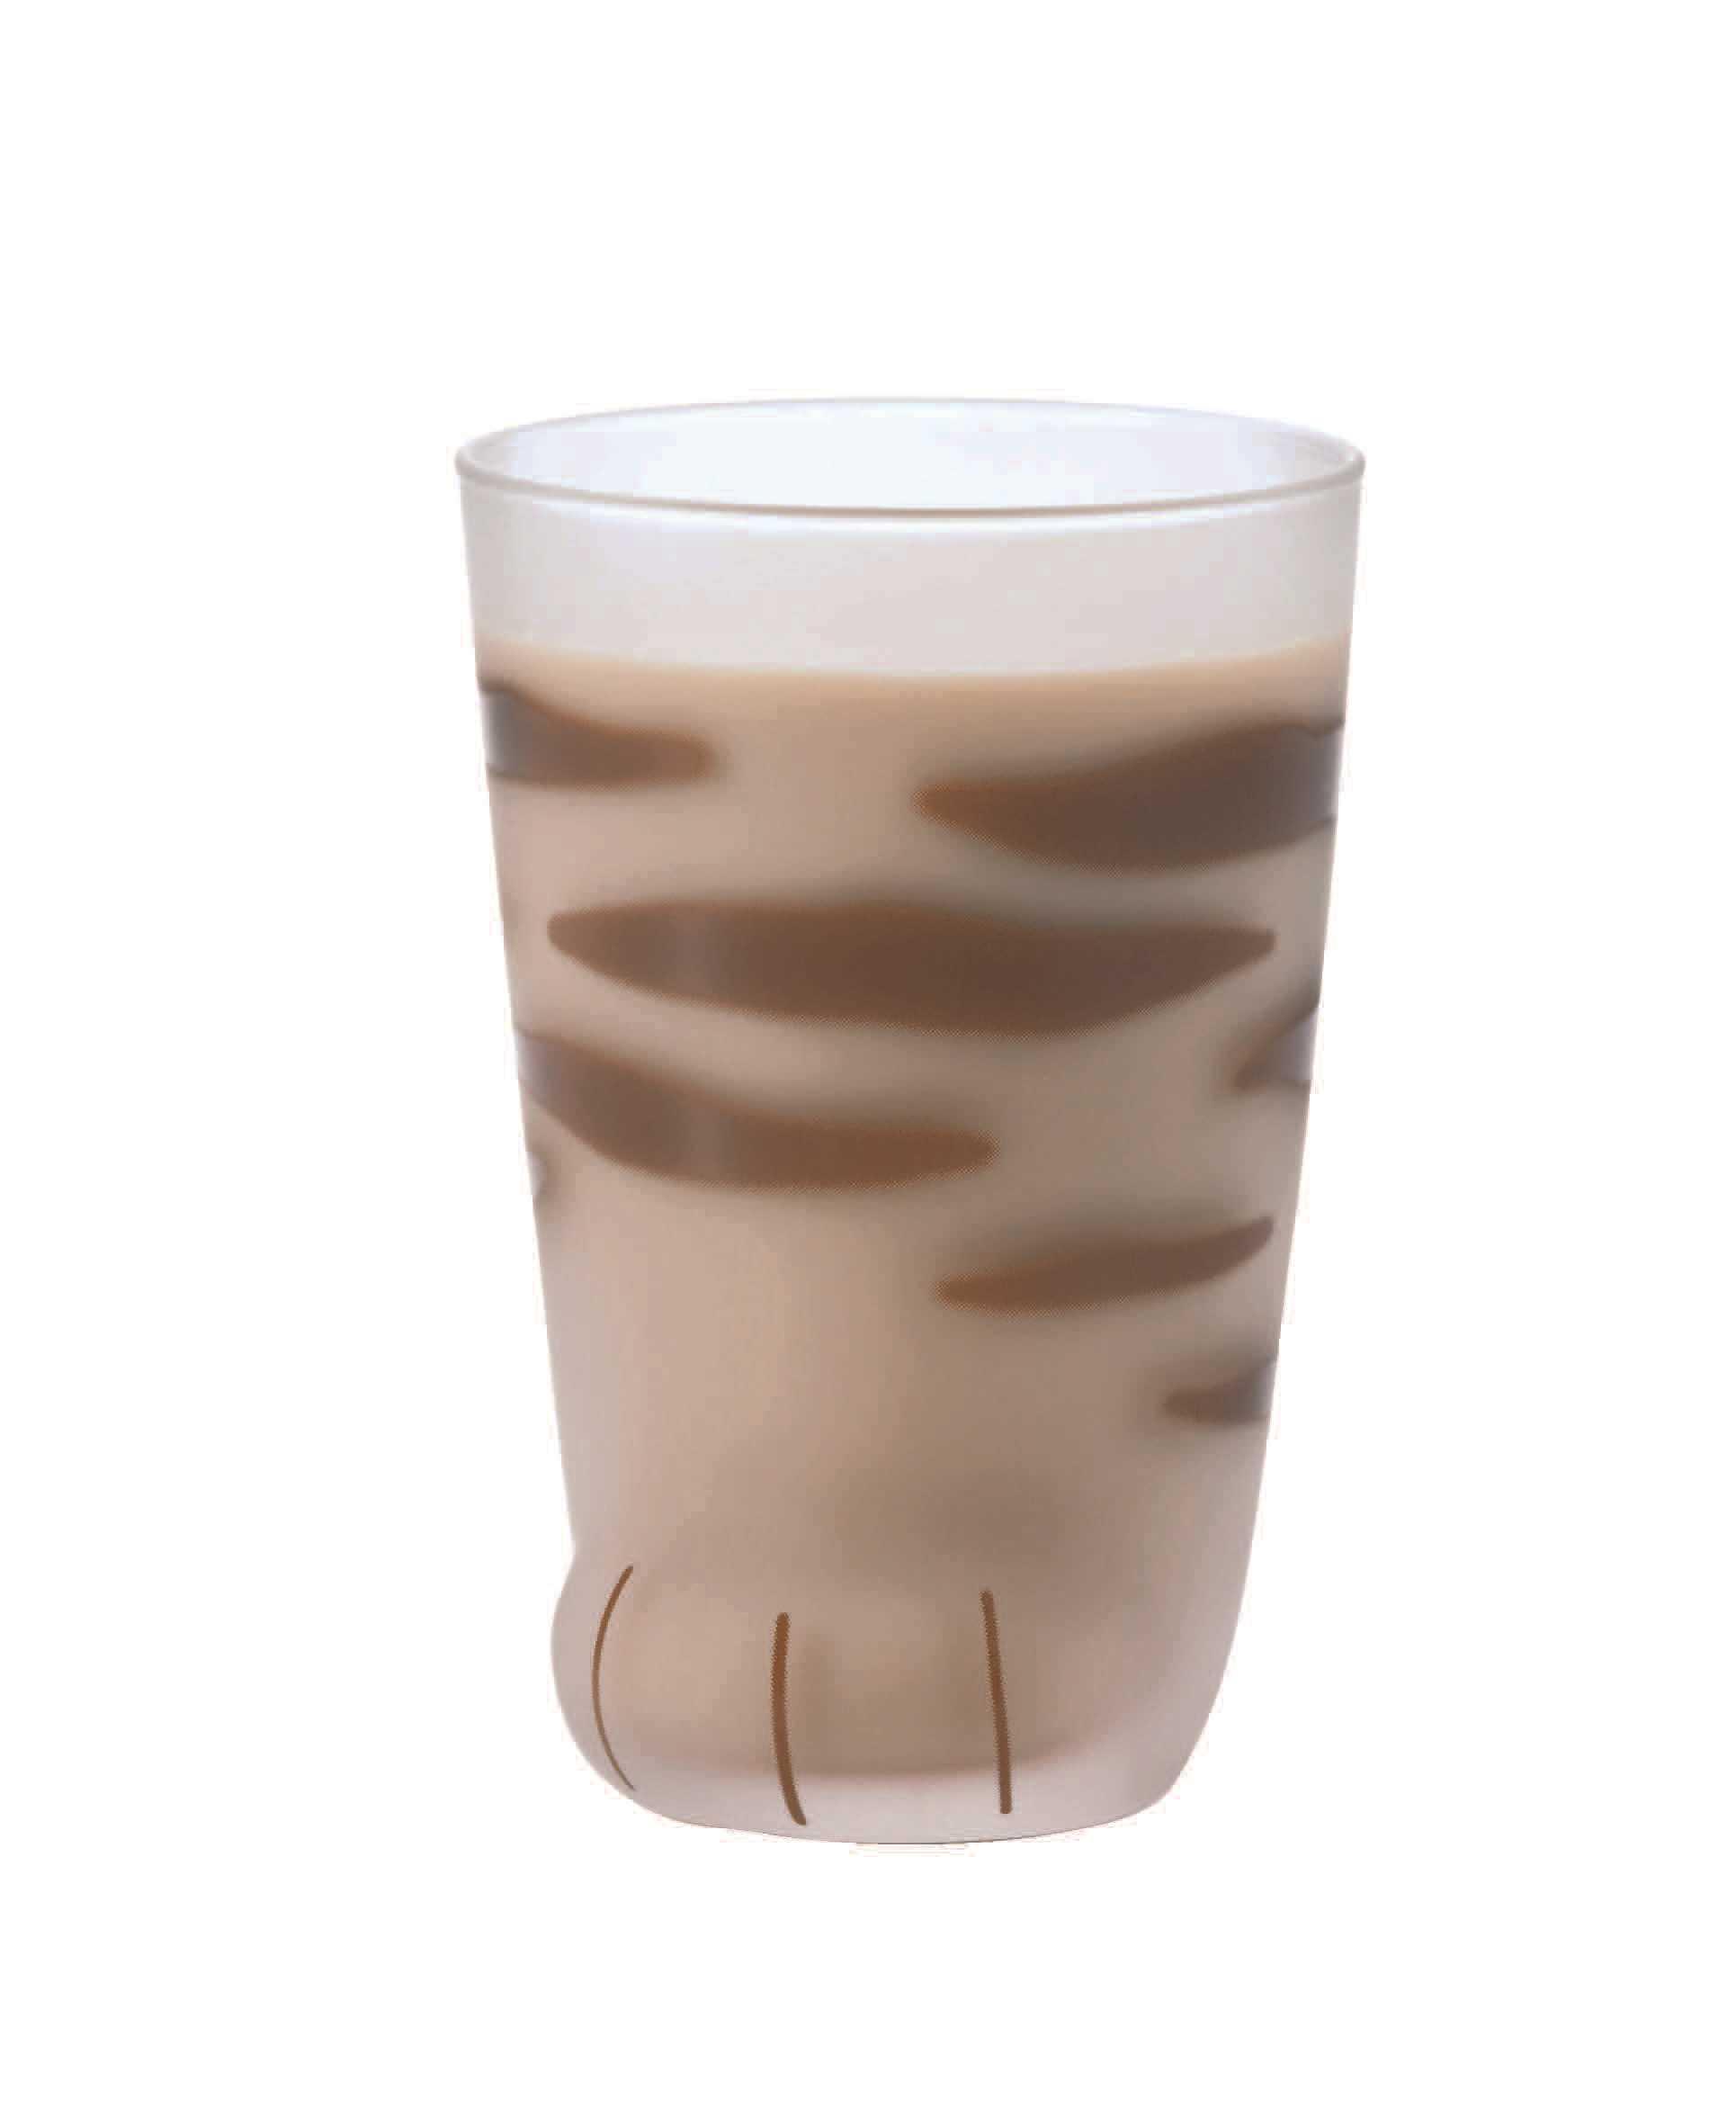 Aderia Coconeco系列貓腳玻璃杯300ml(老虎紋)6680